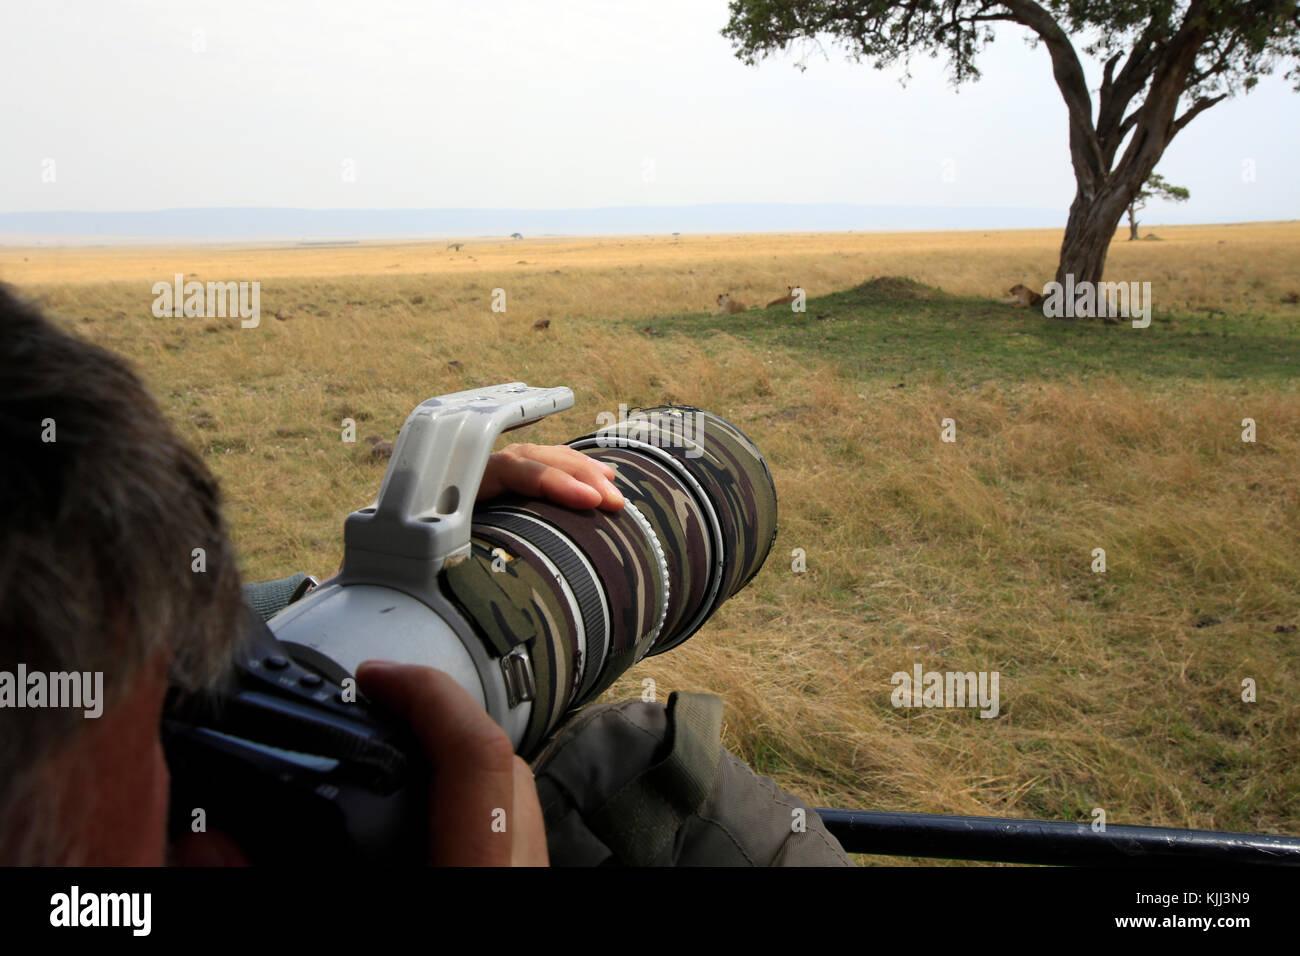 Safari photo. Photographe de la faune. Le Masai Mara. Au Kenya. Photo Stock